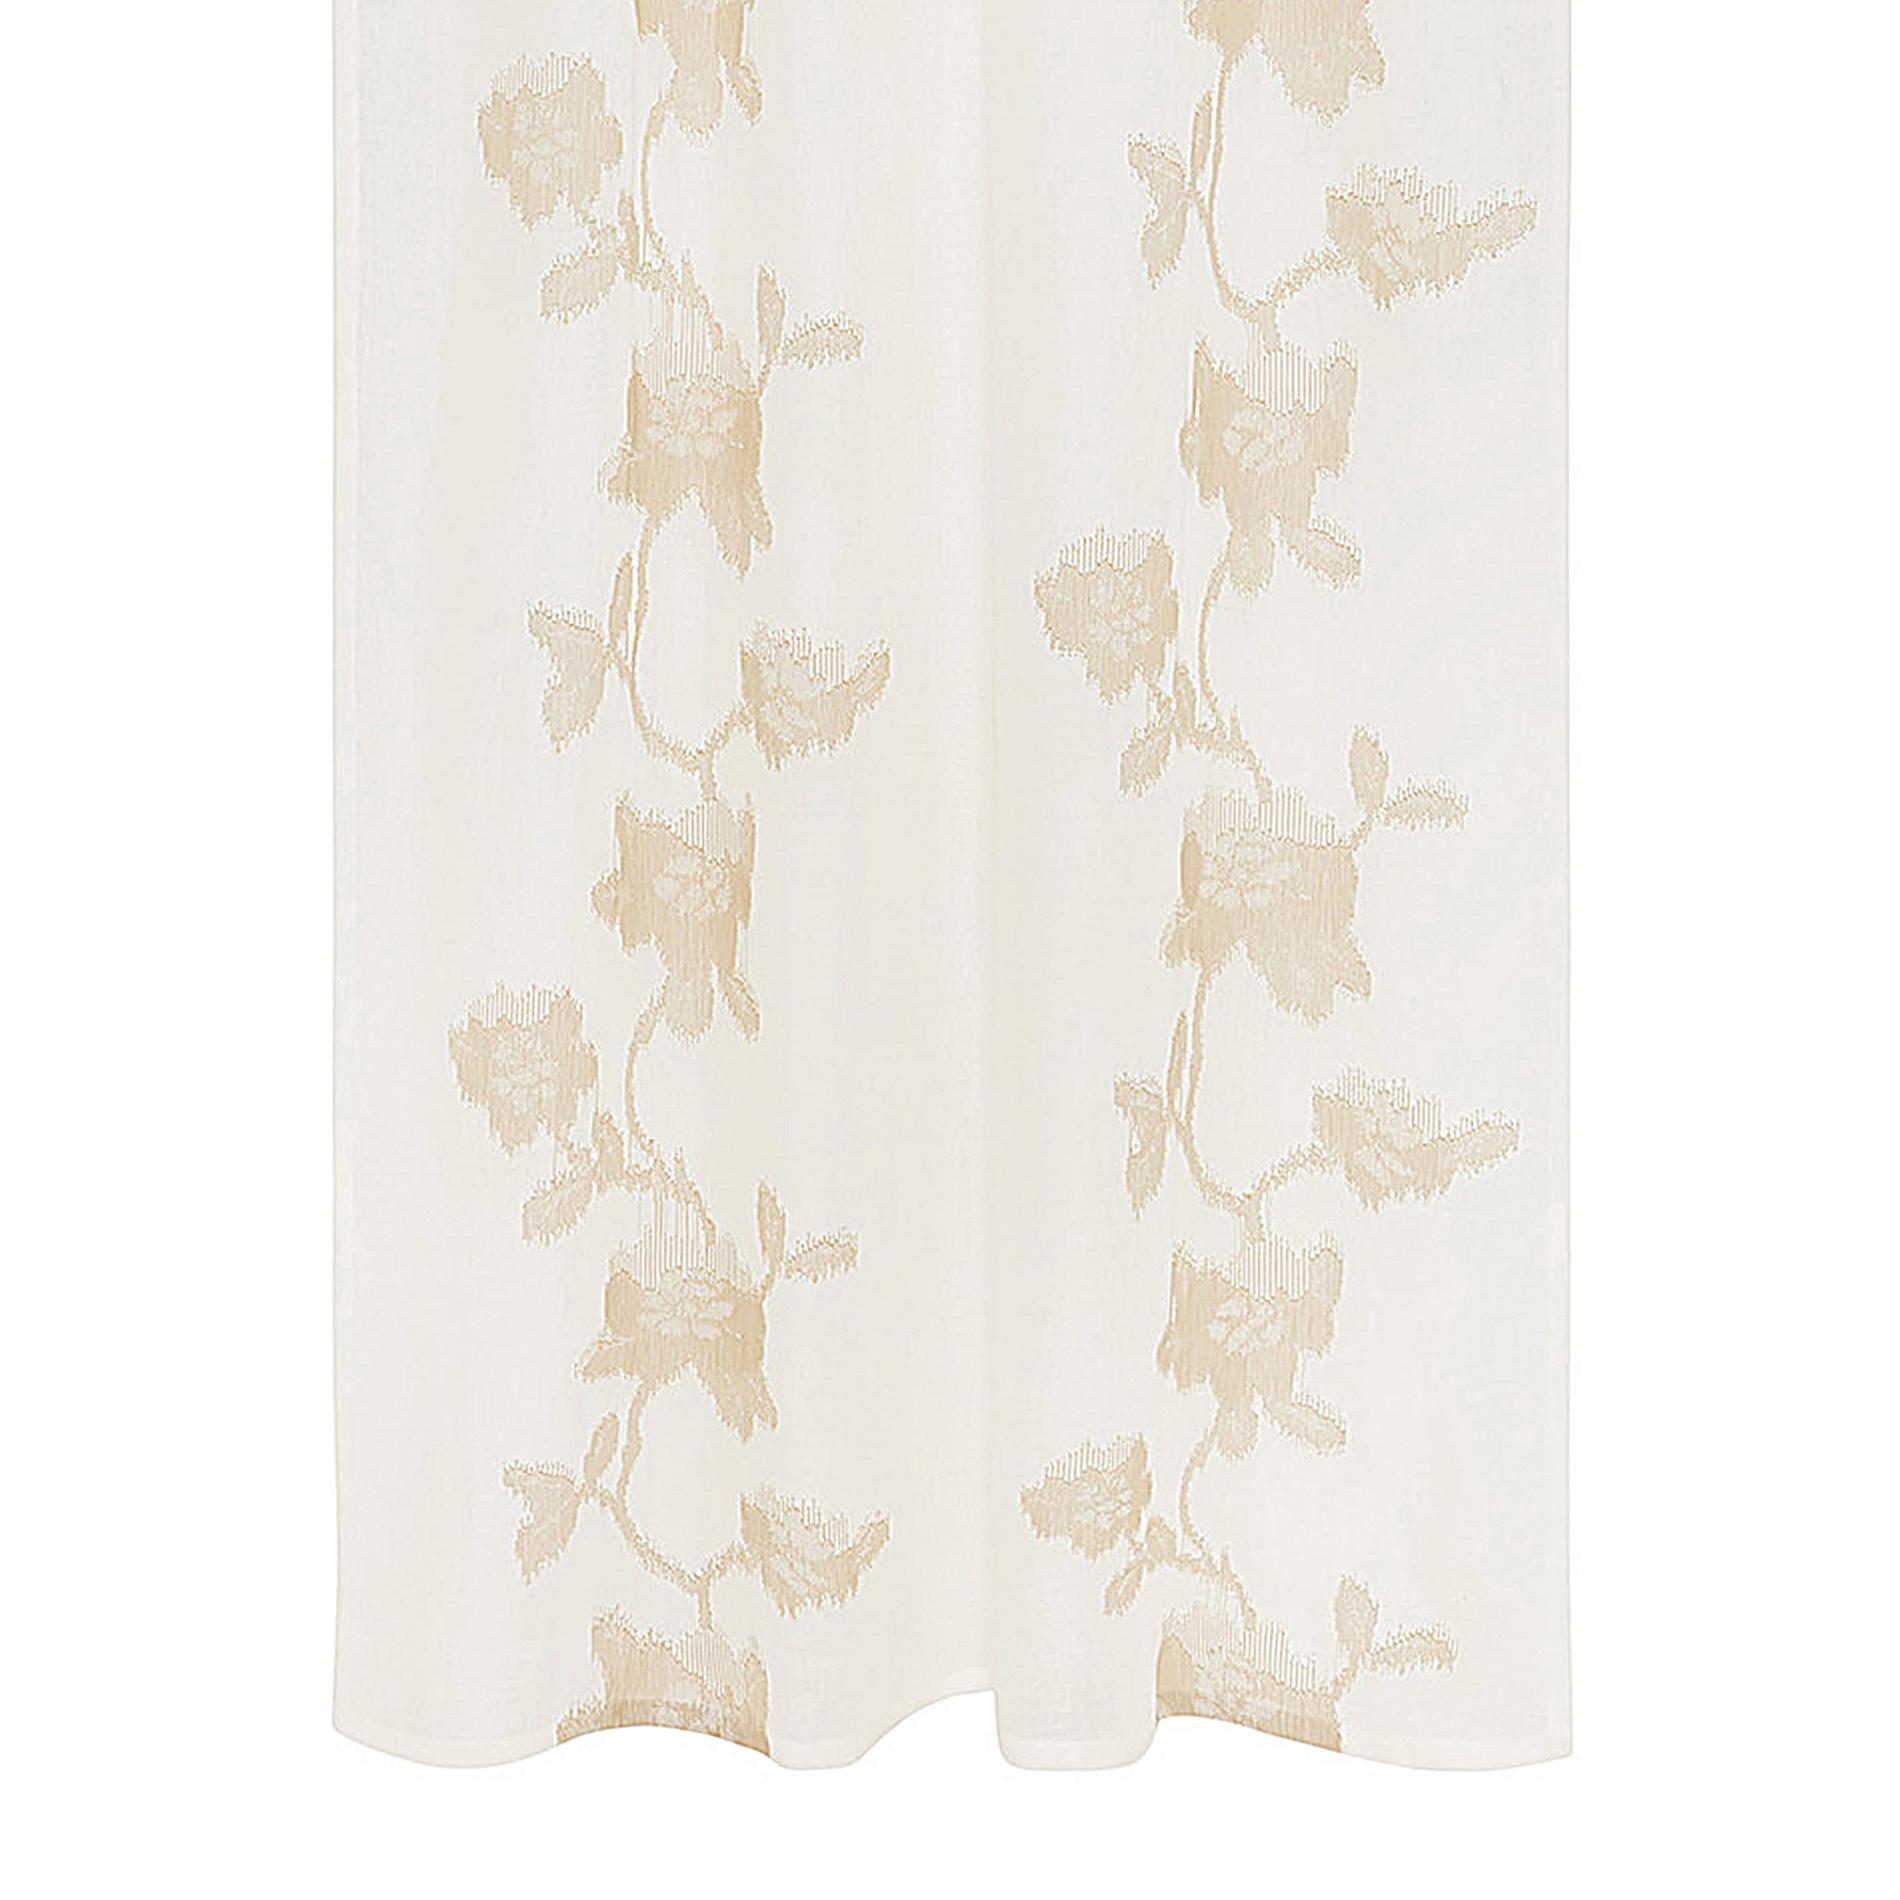 Tenda puro lino ricami floreali, Bianco/Oro, large image number 0